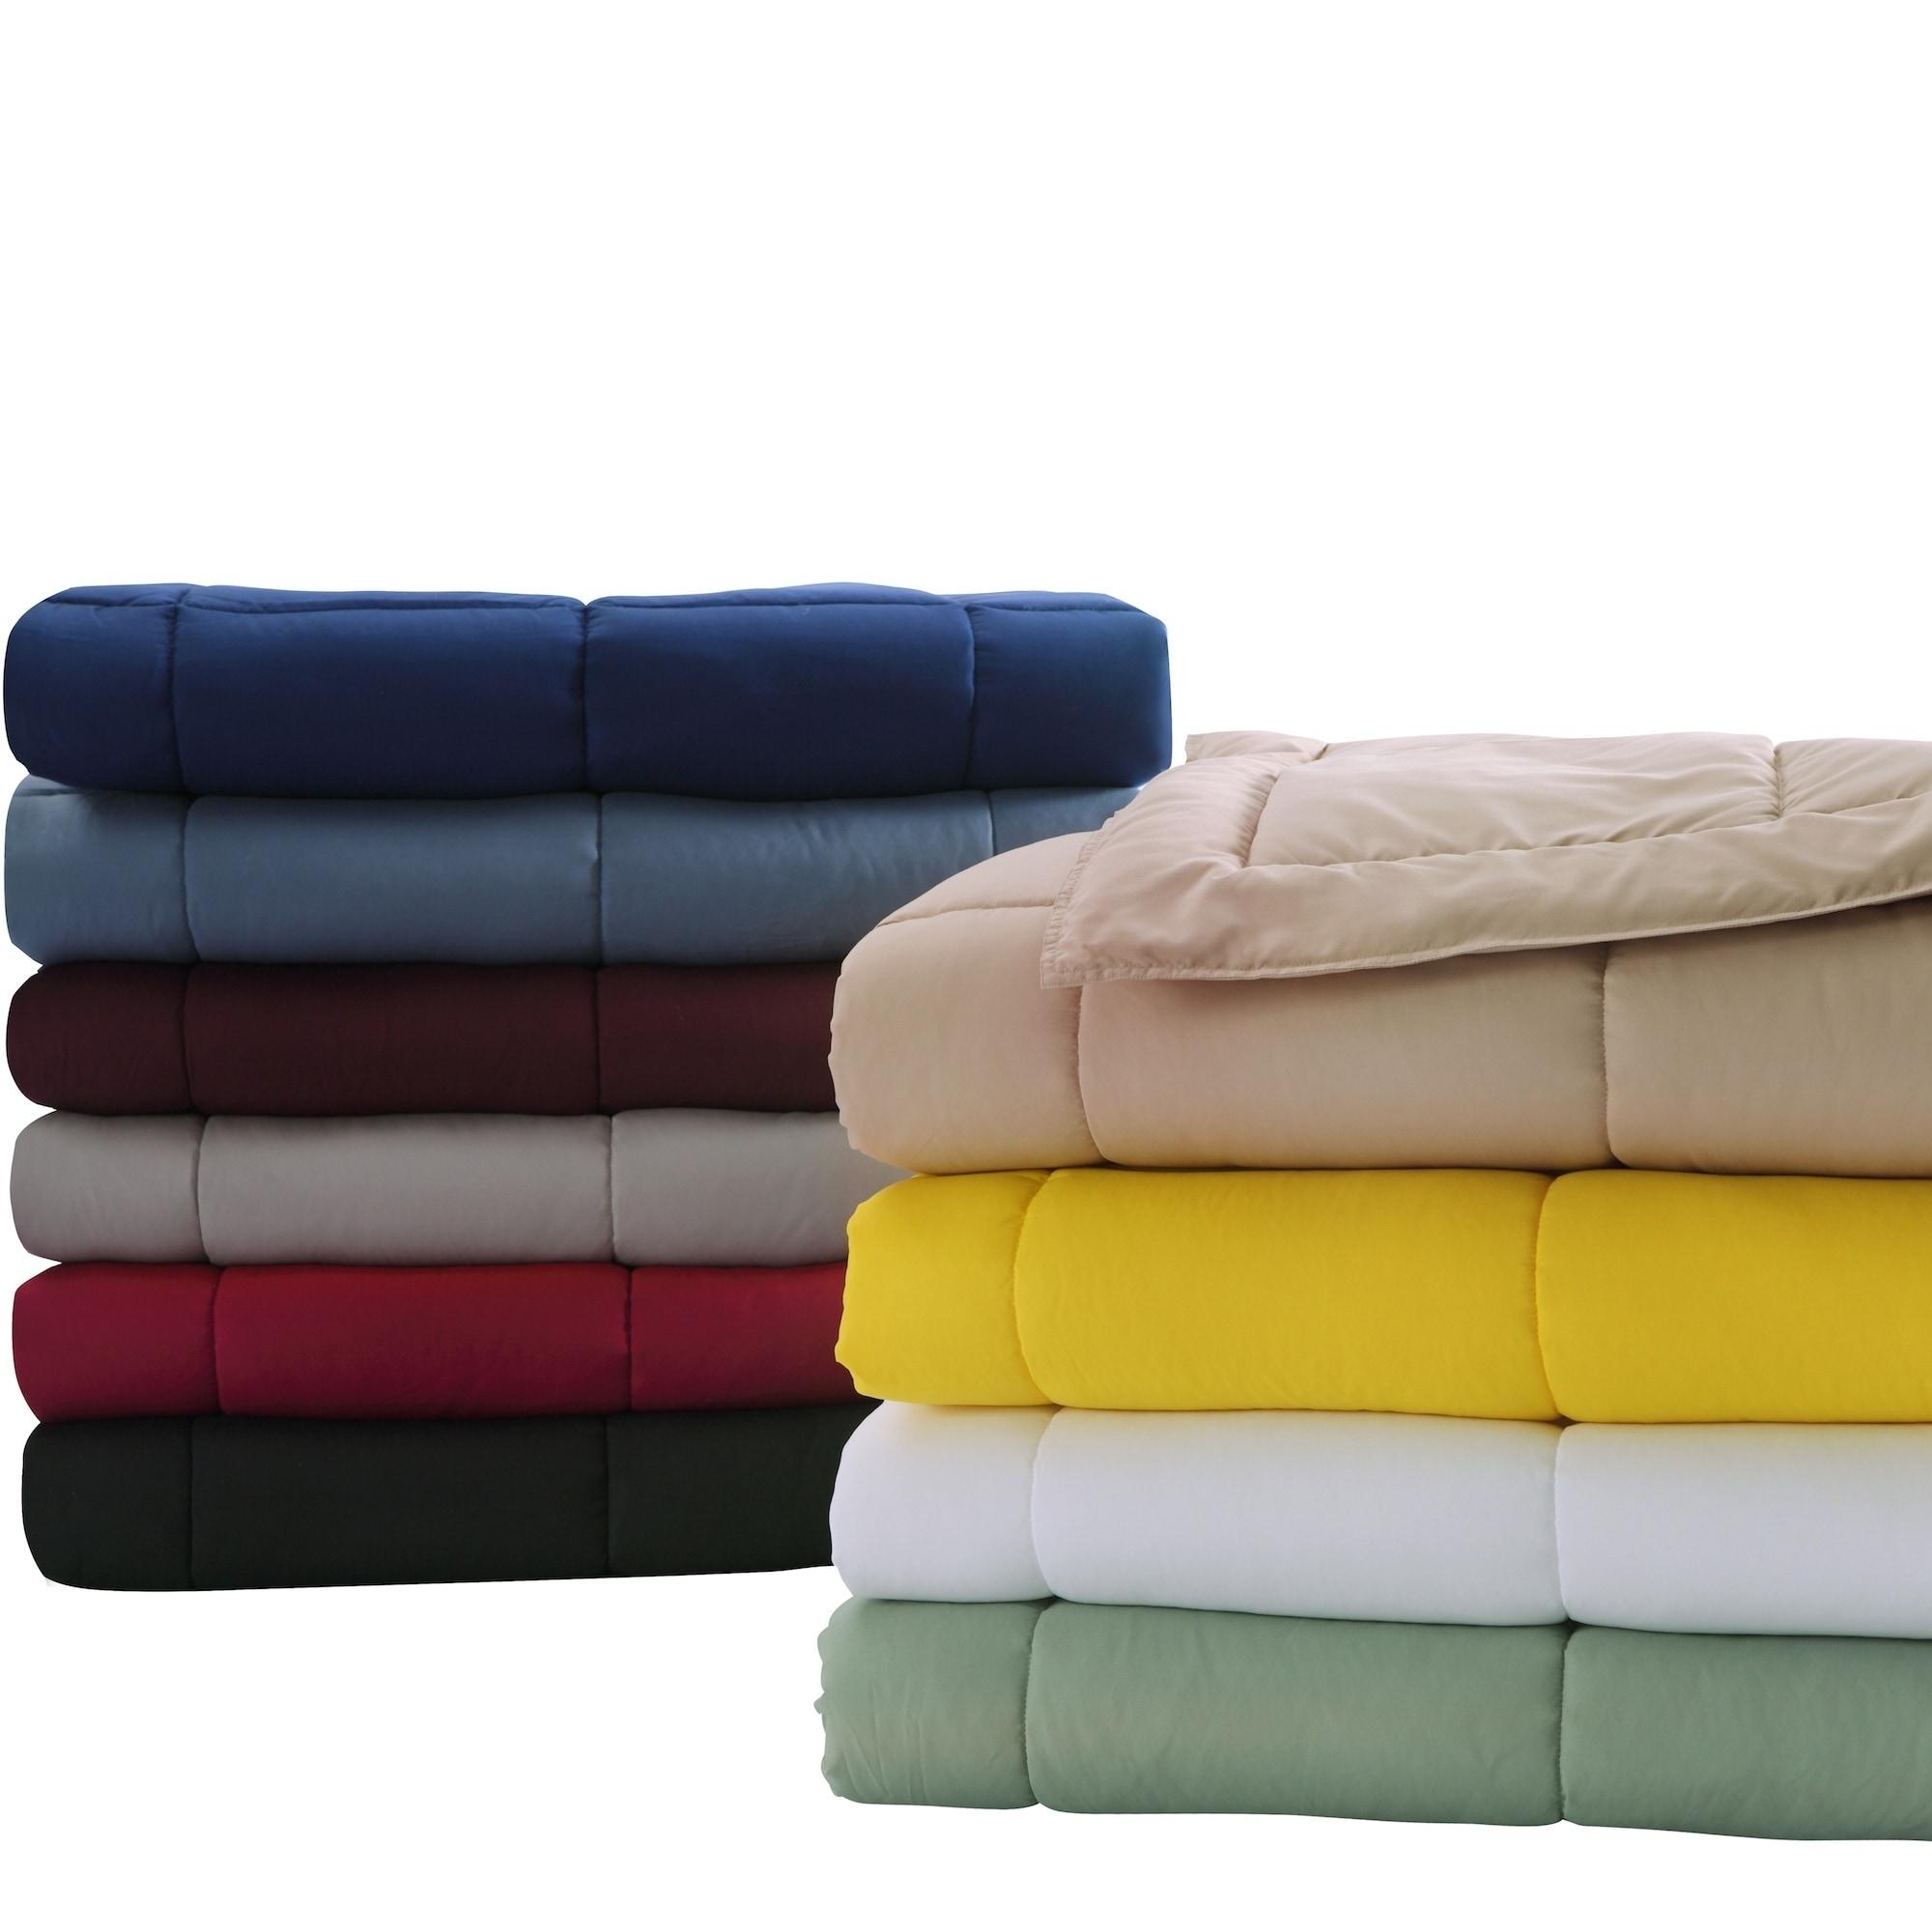 Stayclean Down Alternative Blanket